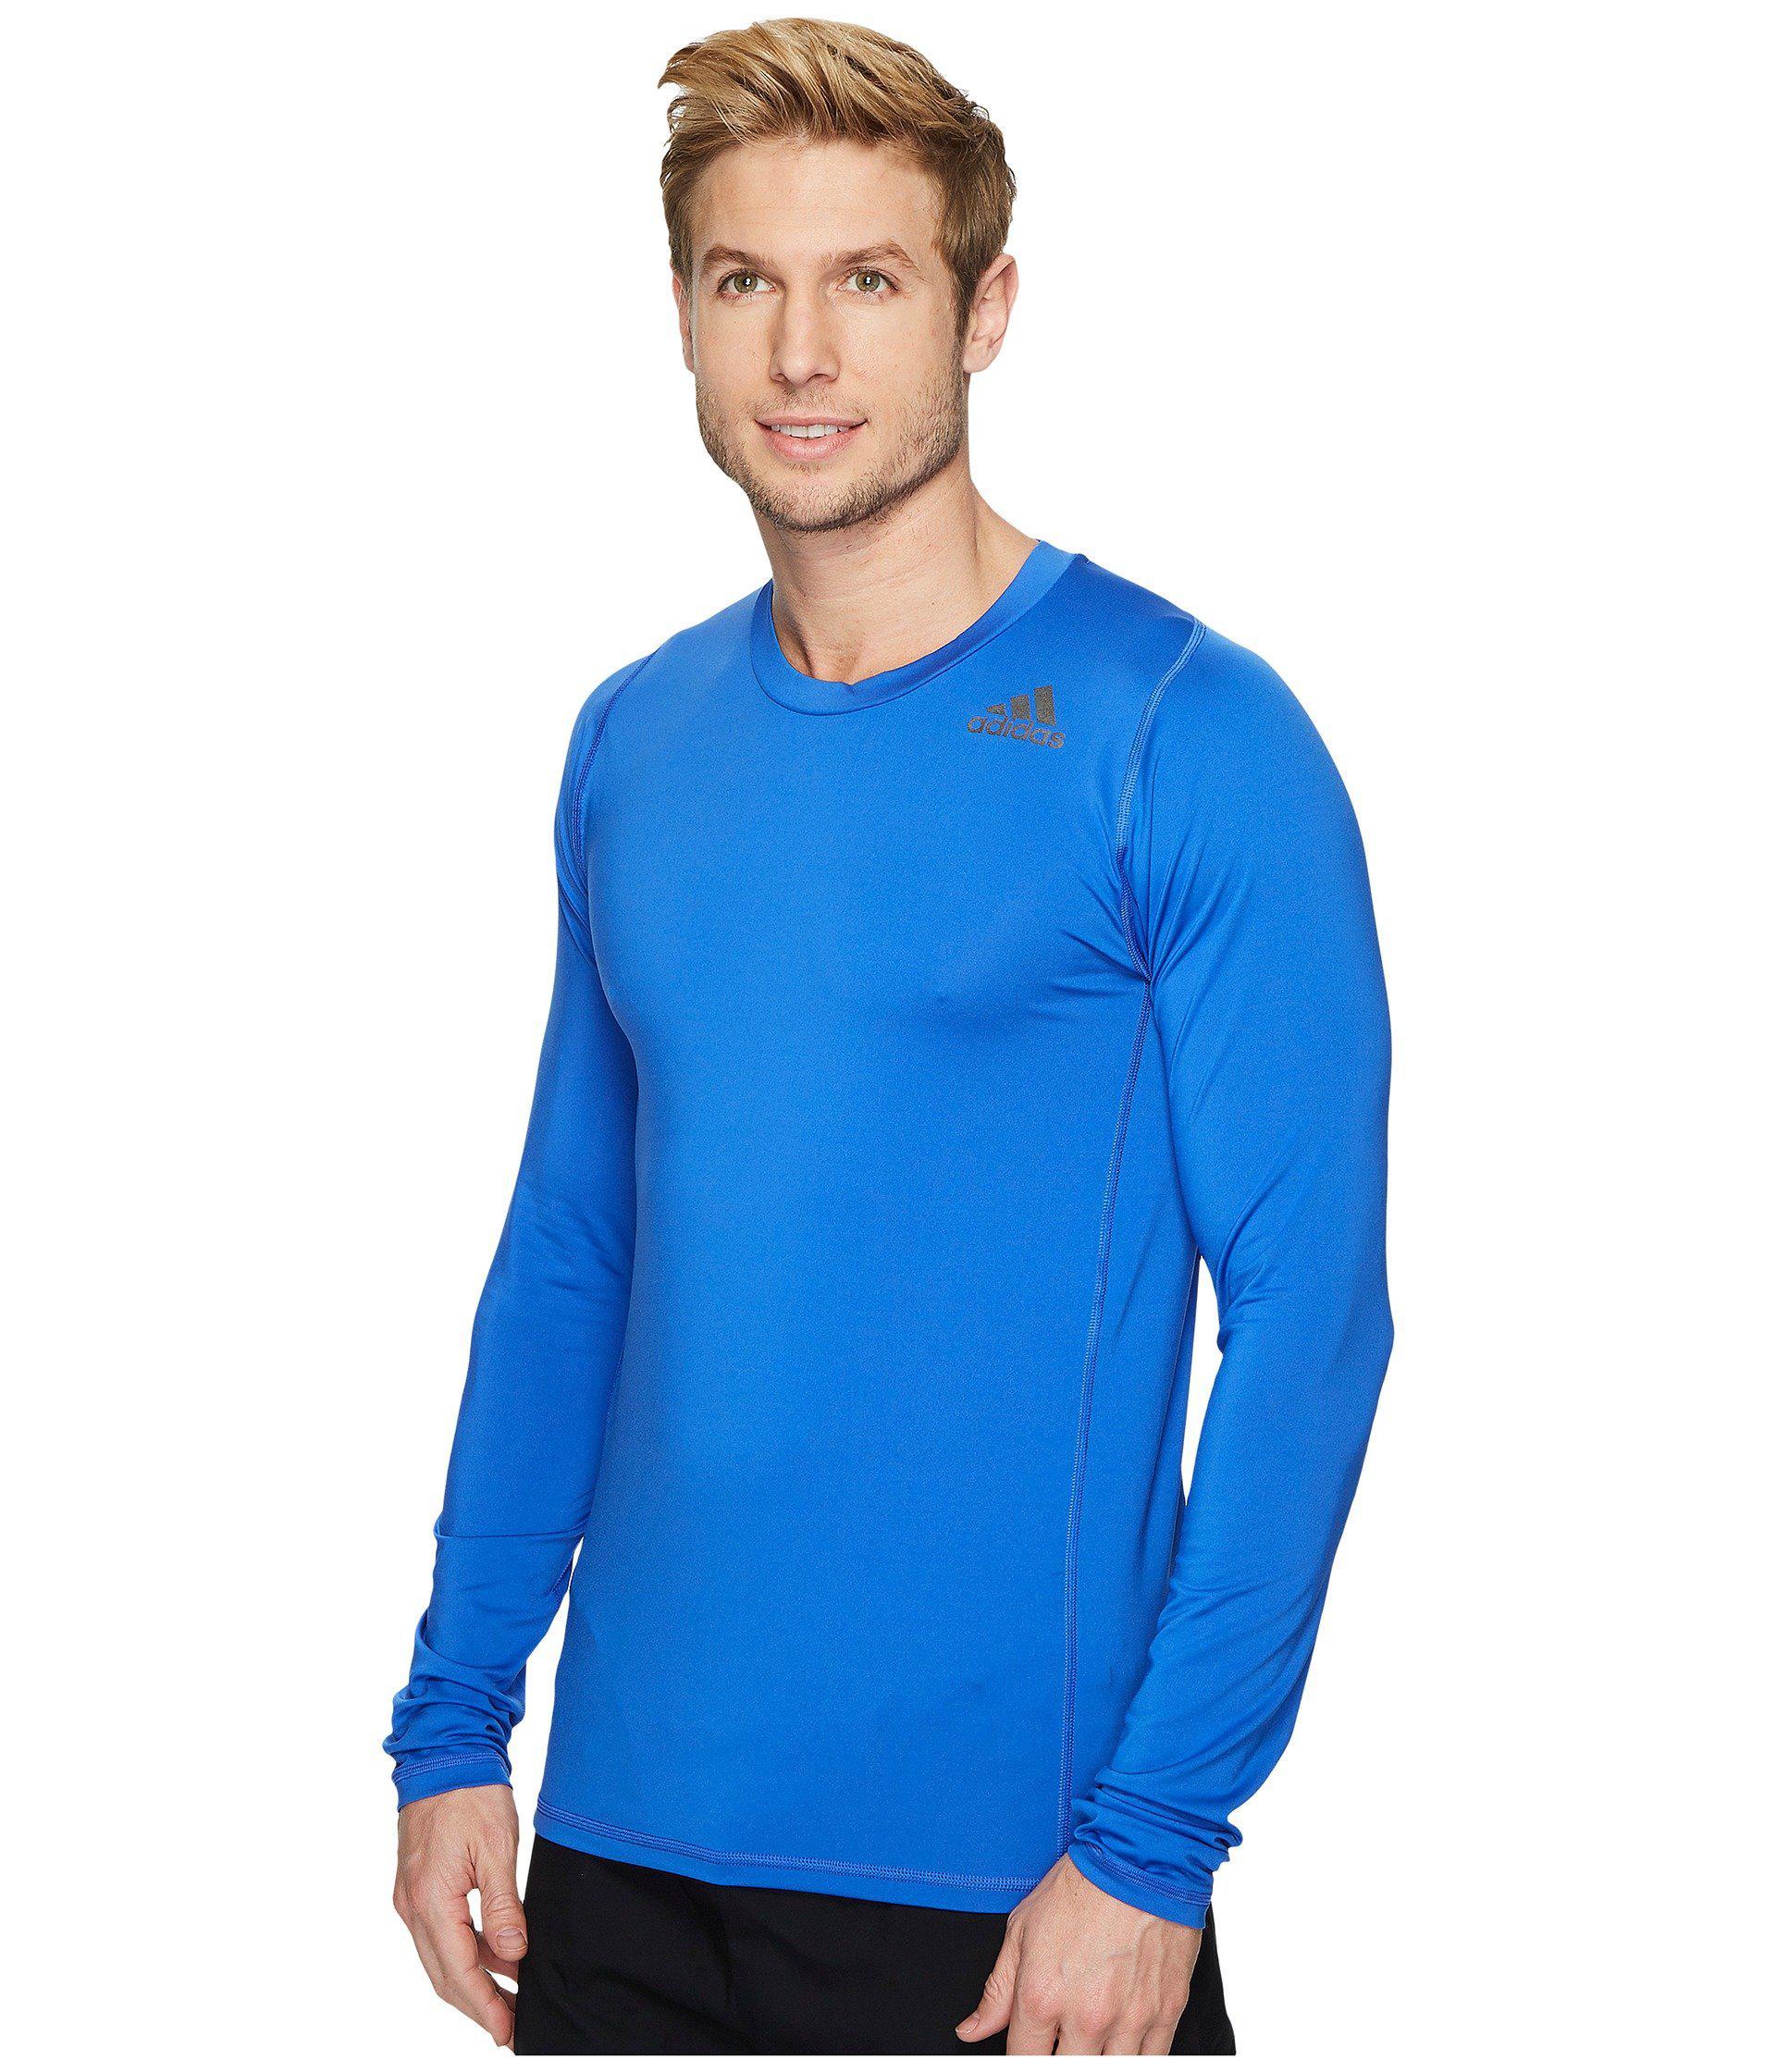 f76b444105abb Men's Blue Alphaskin Sport Fitted Long Sleeve Tee